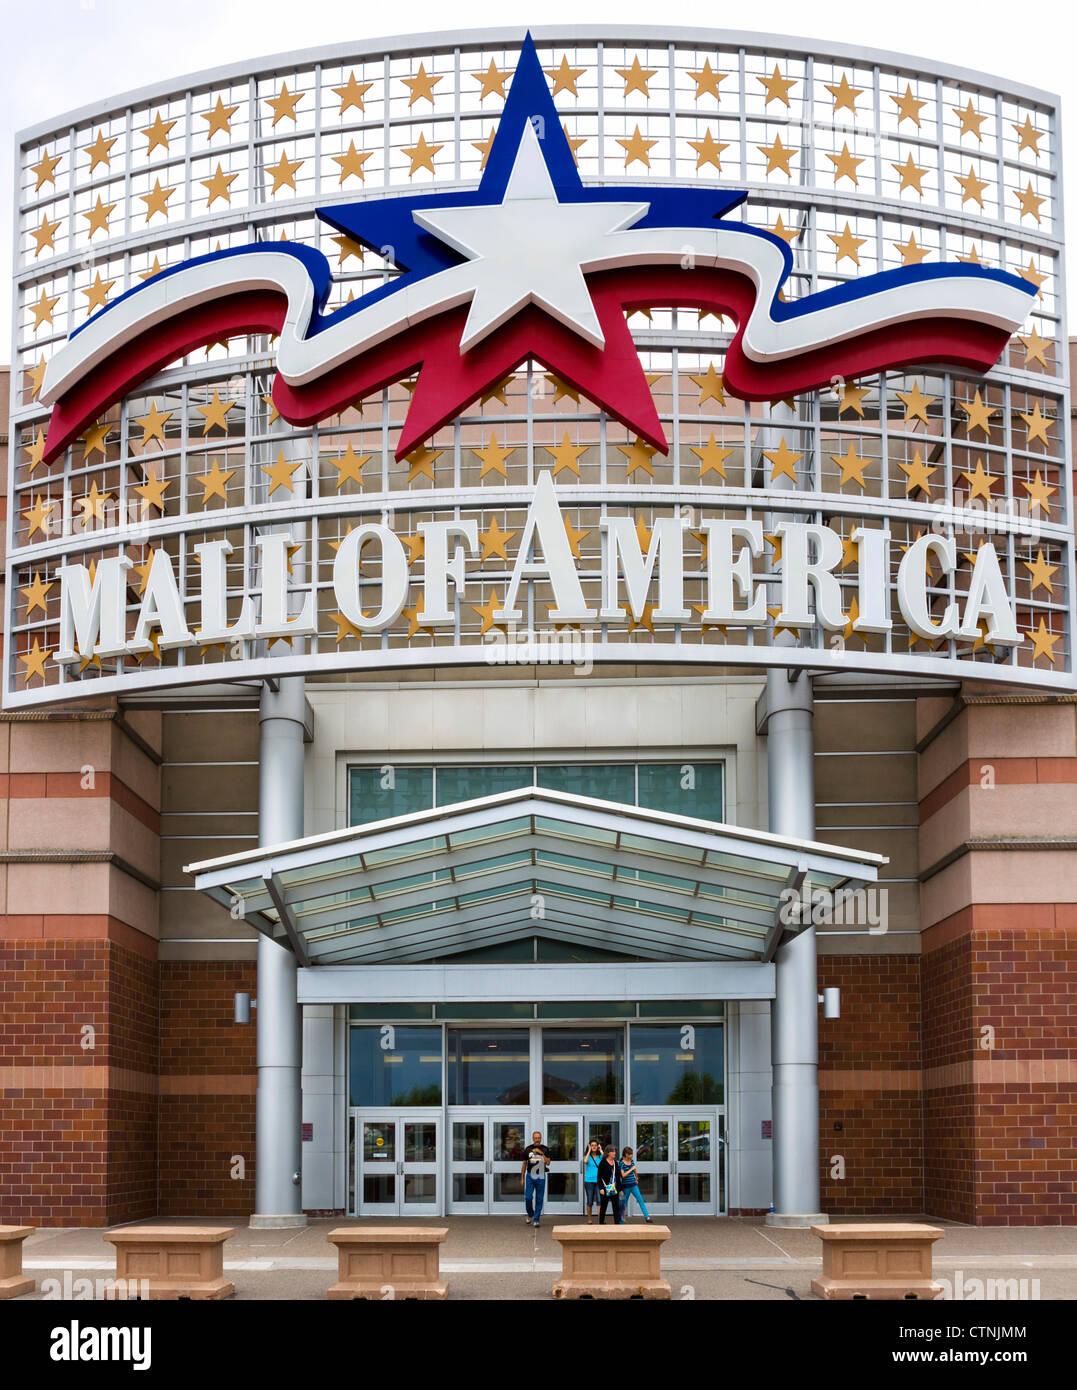 Eingang der Mall of America in Bloomington, Minneapolis, Minnesota, USA Stockbild